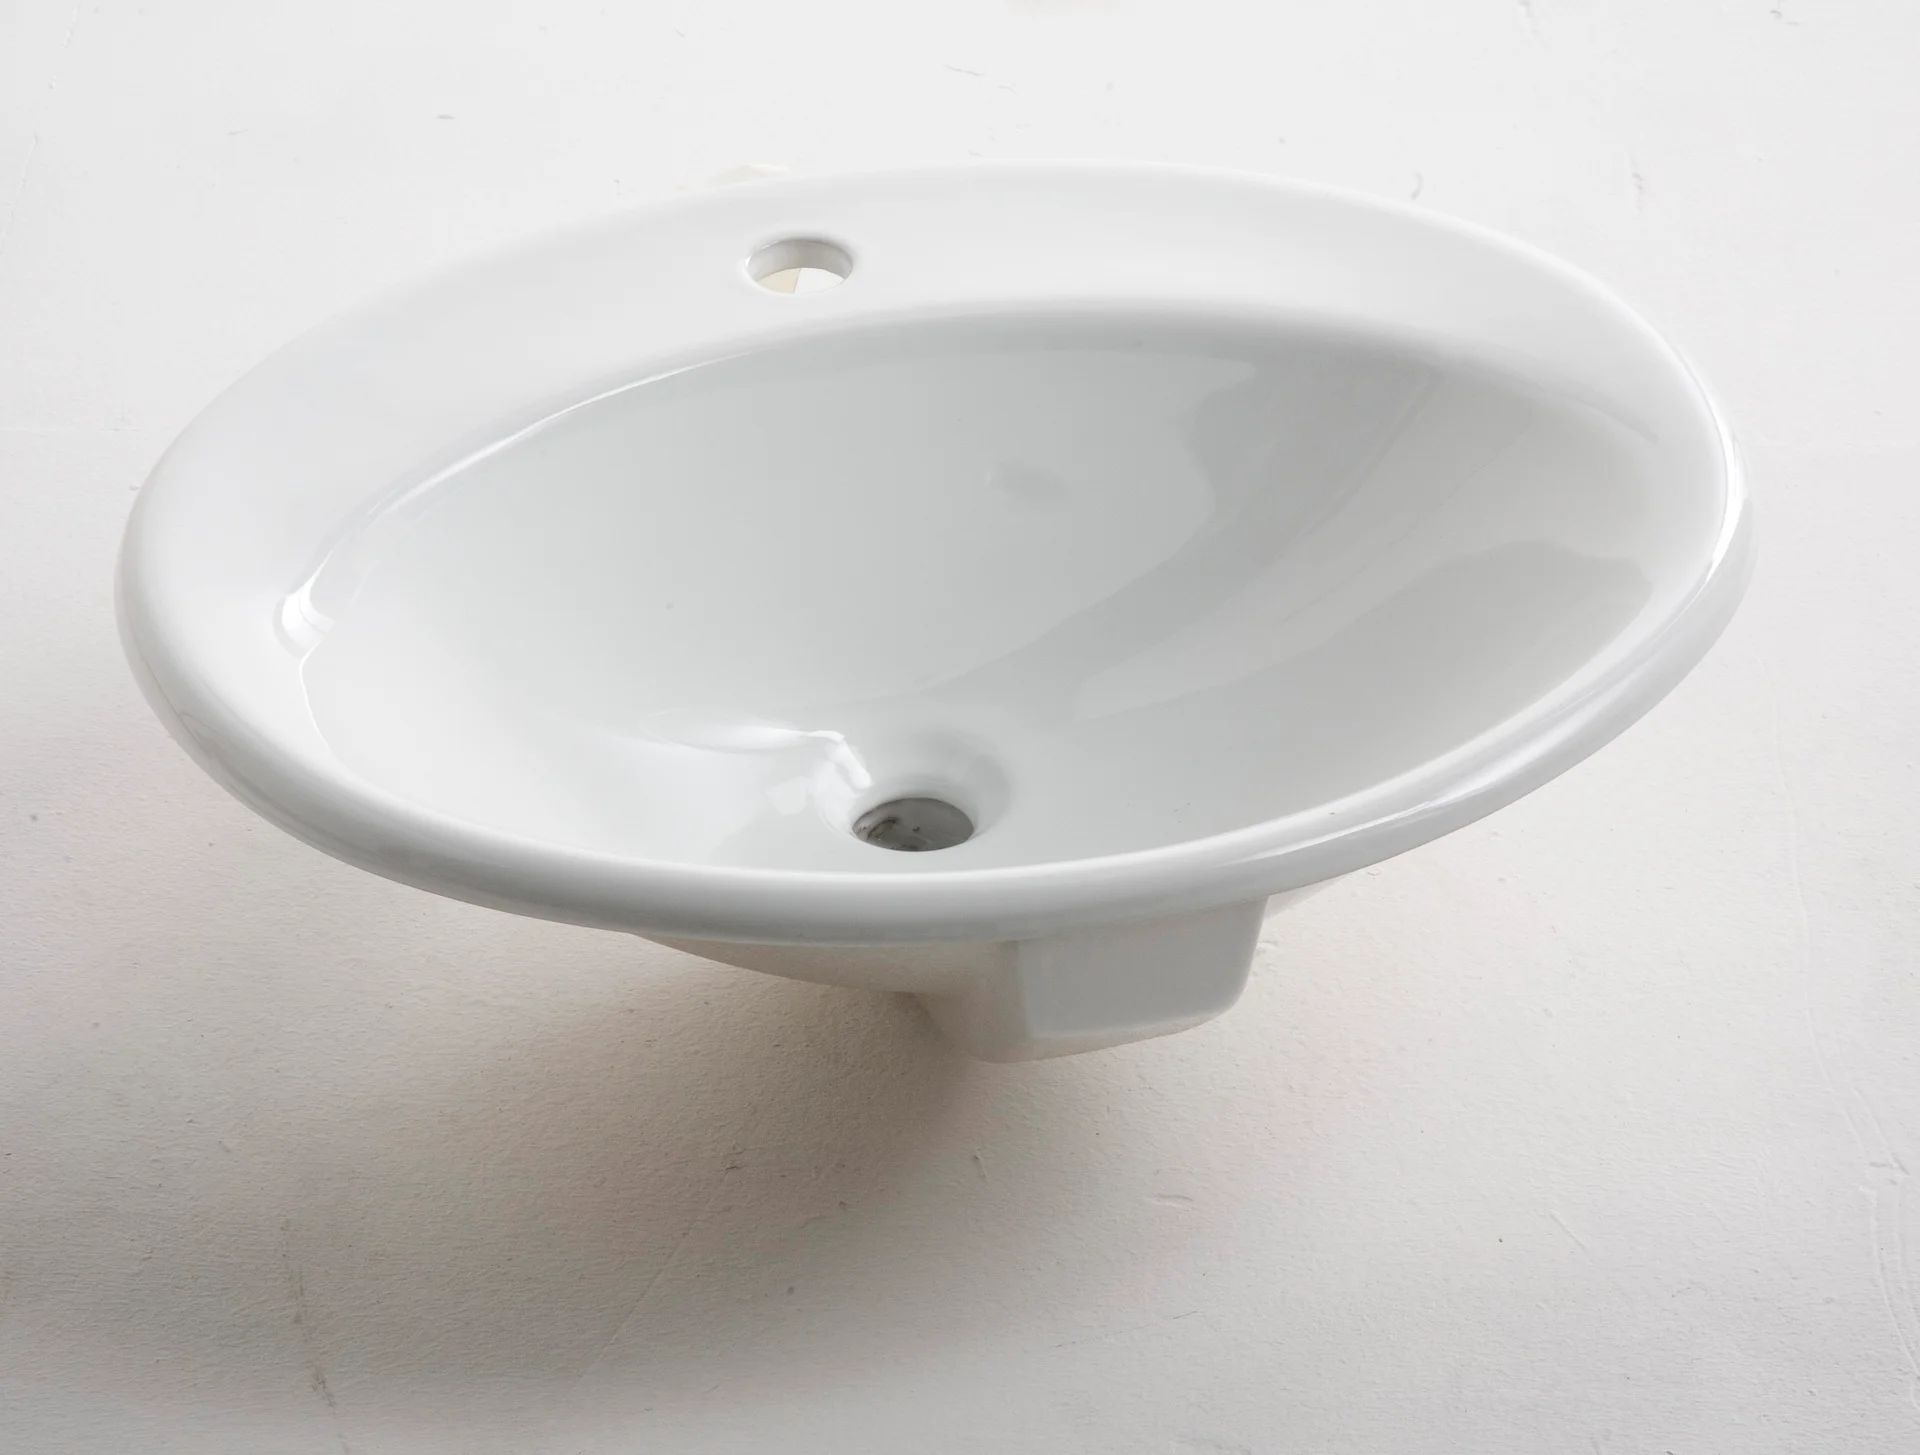 Vasque A Encastrer Ceramique L 56 X P 48 Cm Blanc Olympe Leroy Merlin